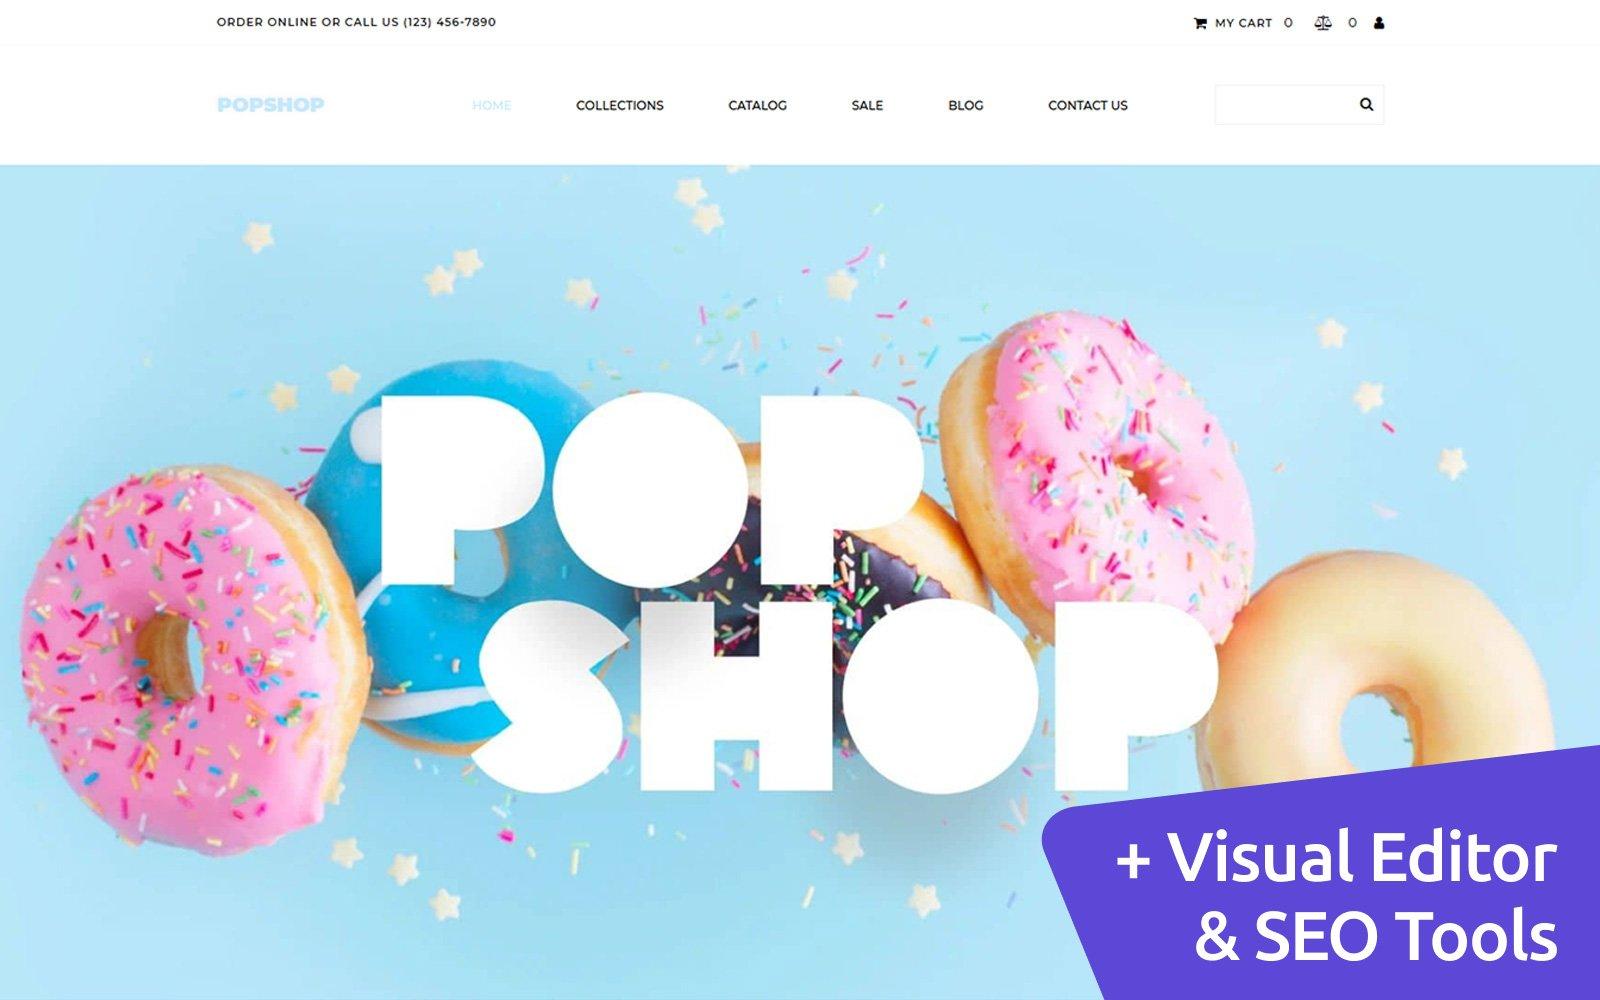 Reszponzív Popshop - Sweet Shop MotoCMS Ecommerce sablon 102547